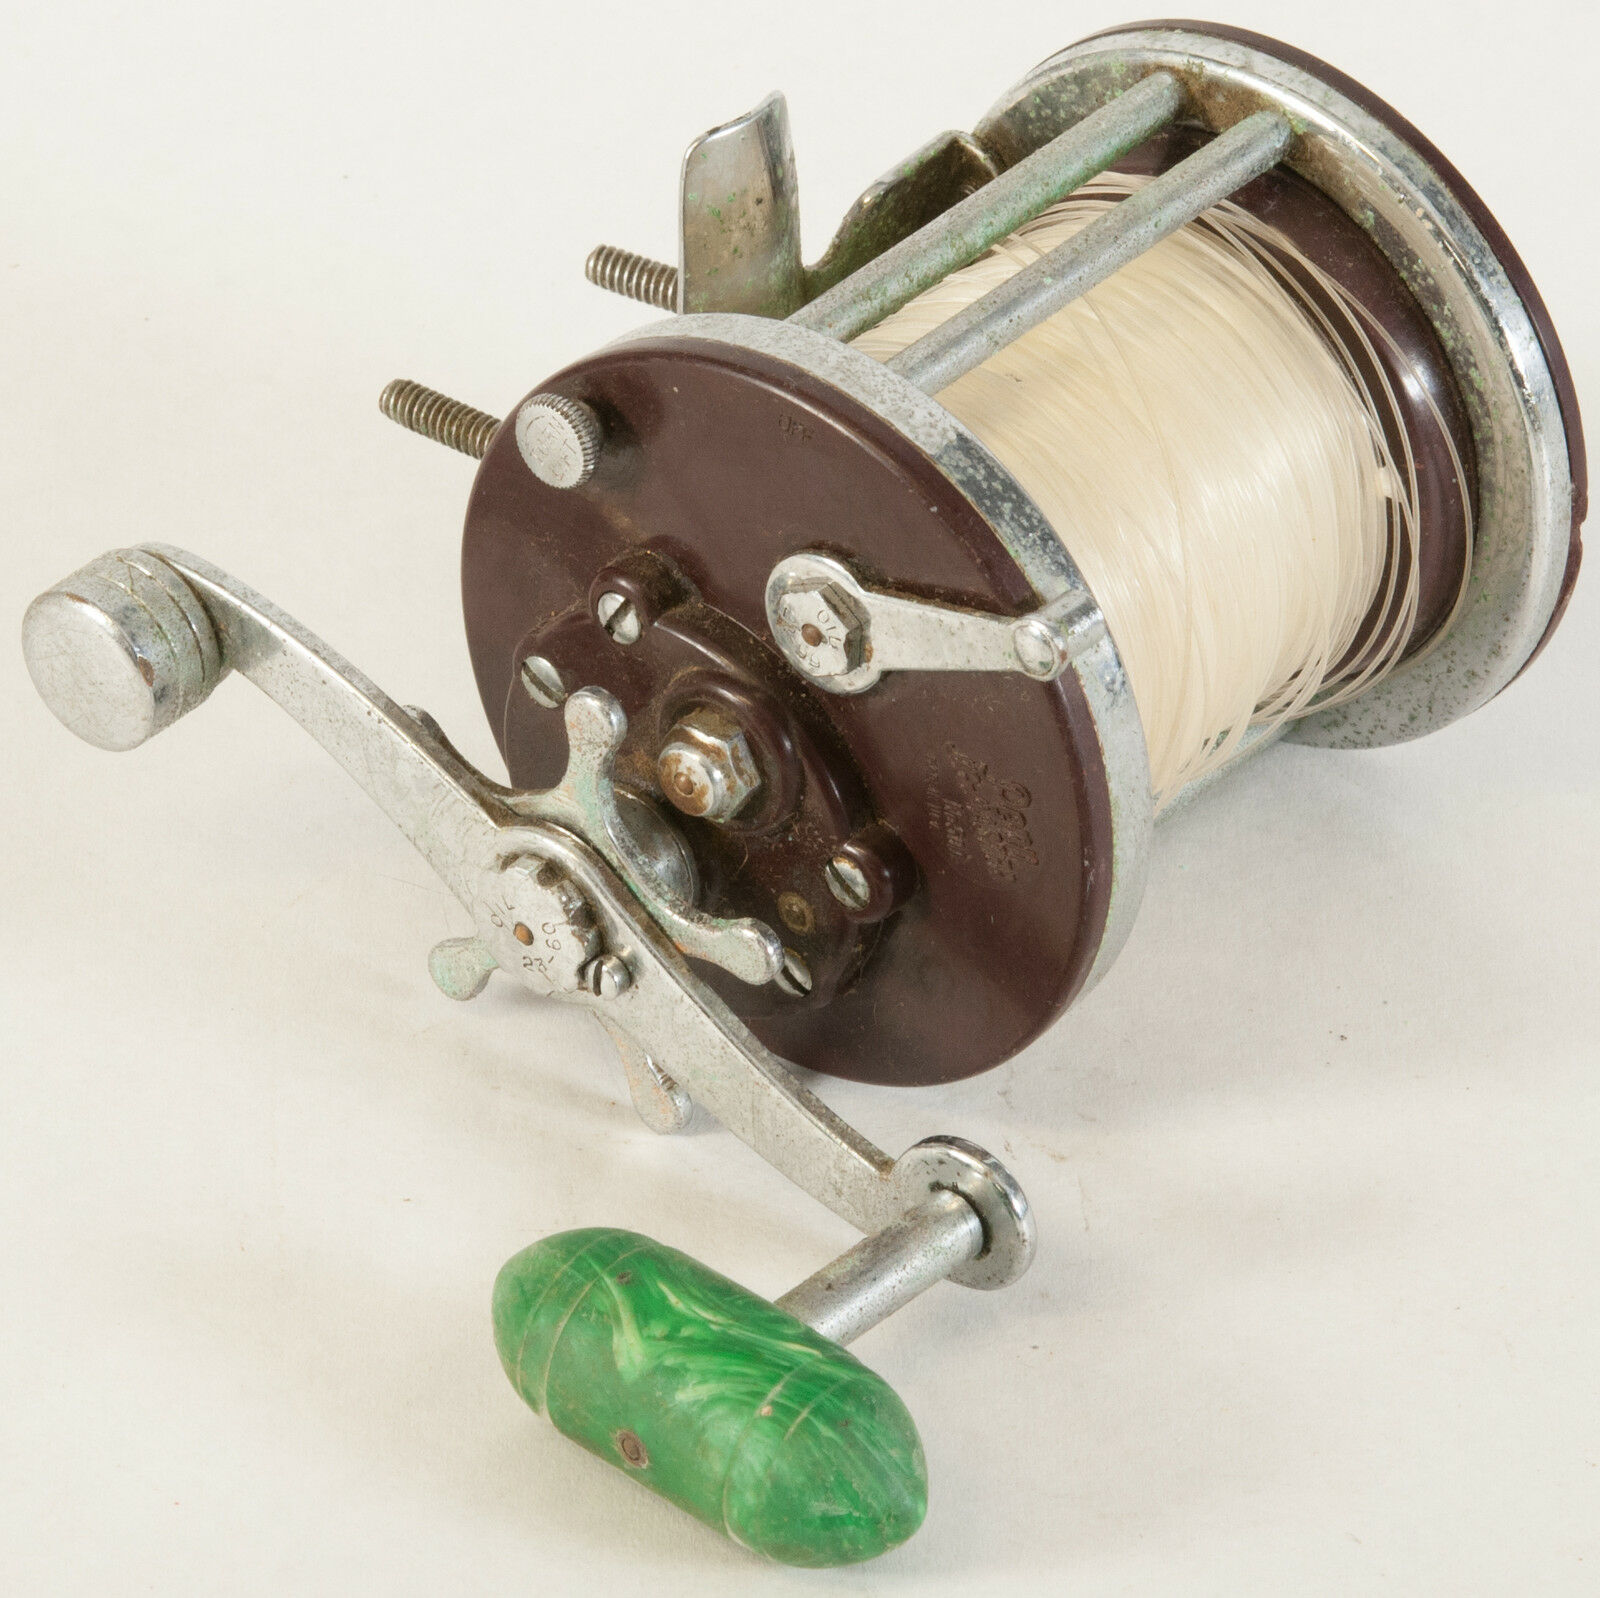 Penn Jig-Master 500 Fishing Reel Green Knob G+  Condition  no.1 online